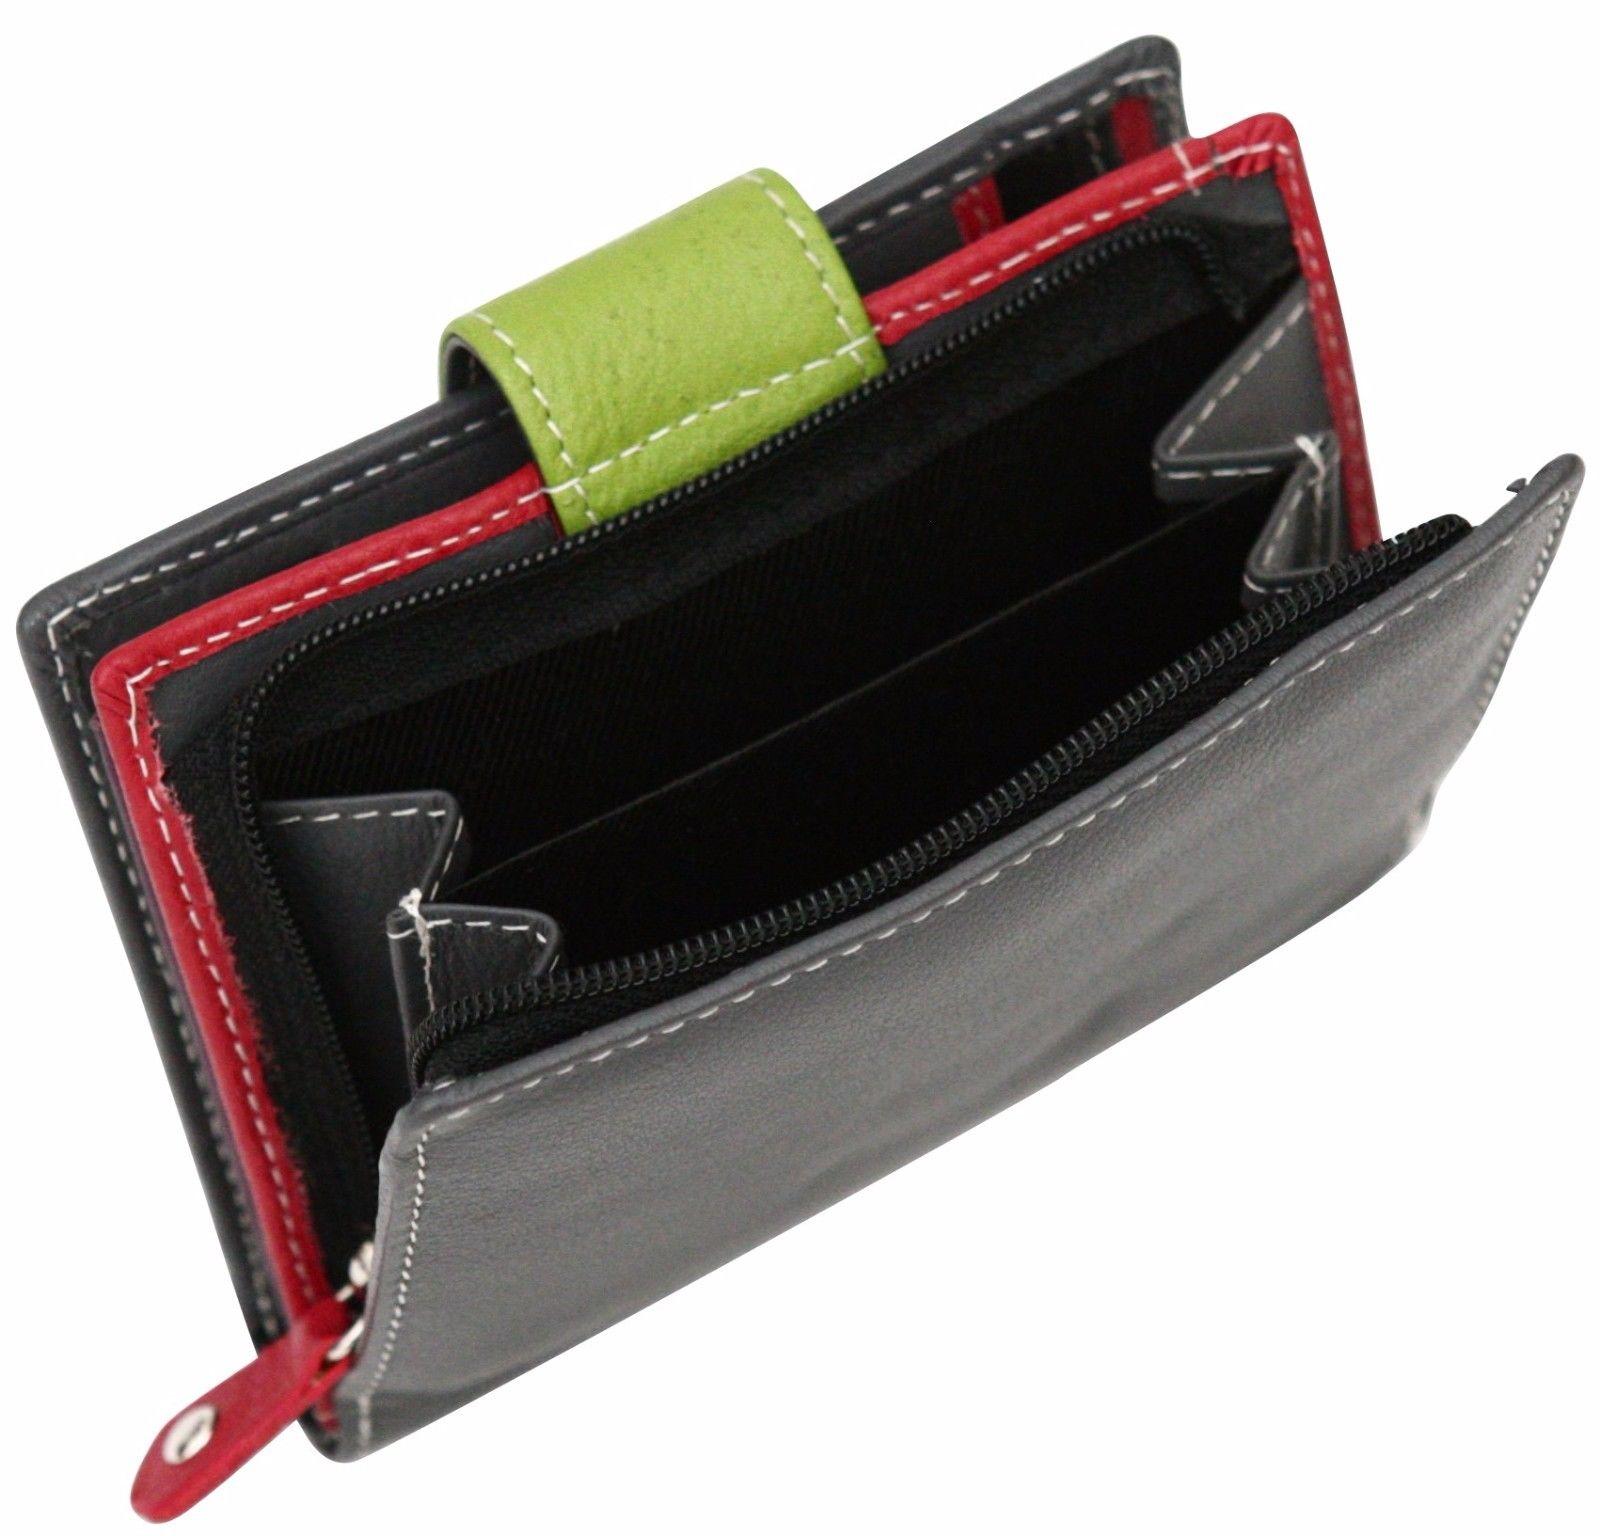 Felda-RFID-onorevoli-MEDAGLIA-amp-Card-Purse-Wallet-Genuine-Leather-Multi-SOFT-BOX-REGALO miniatura 41